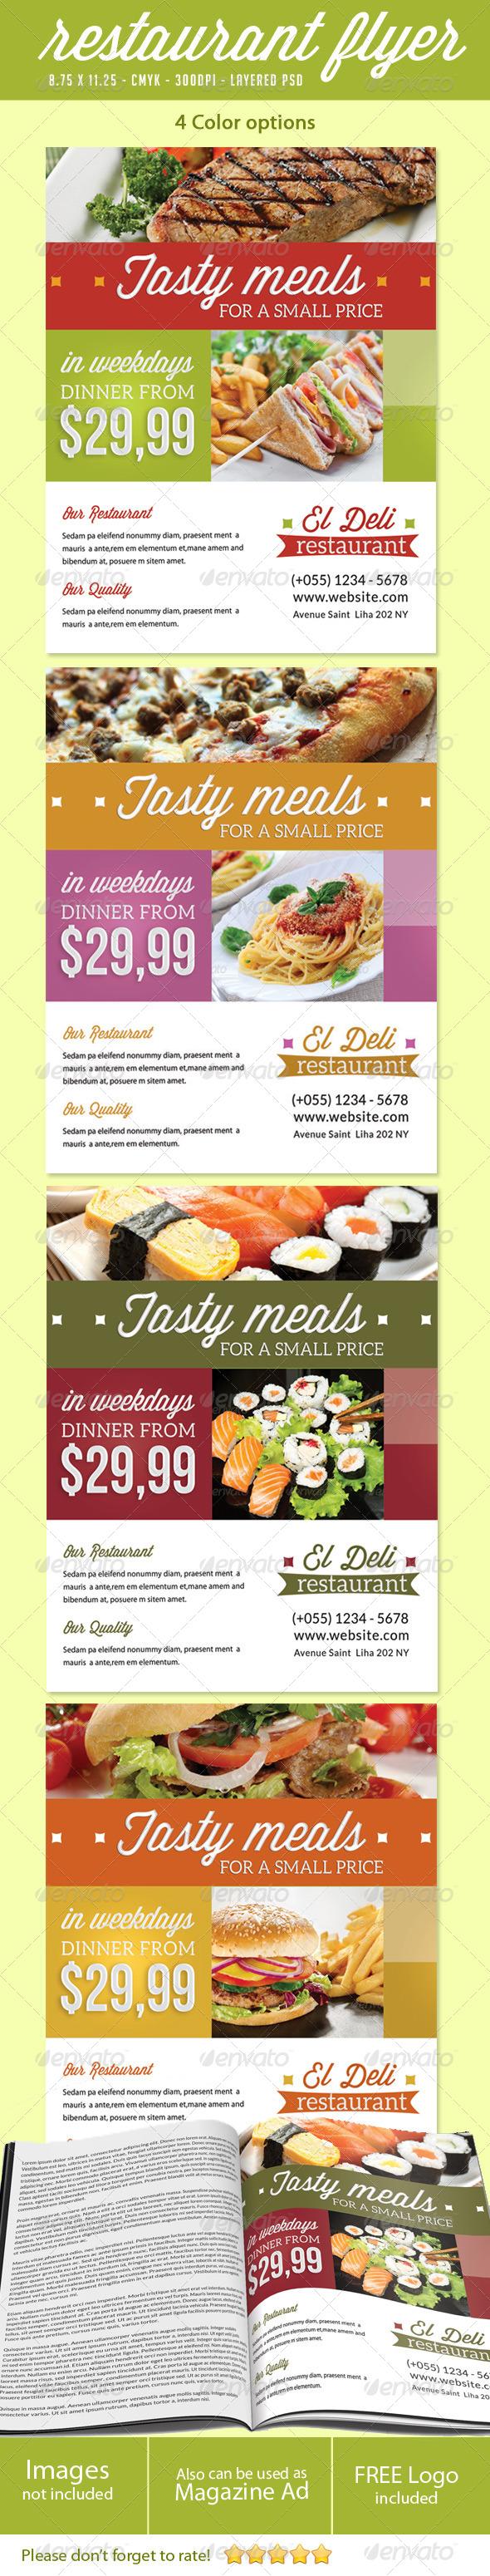 GraphicRiver Restaurant Flyer Print Ad 5444346